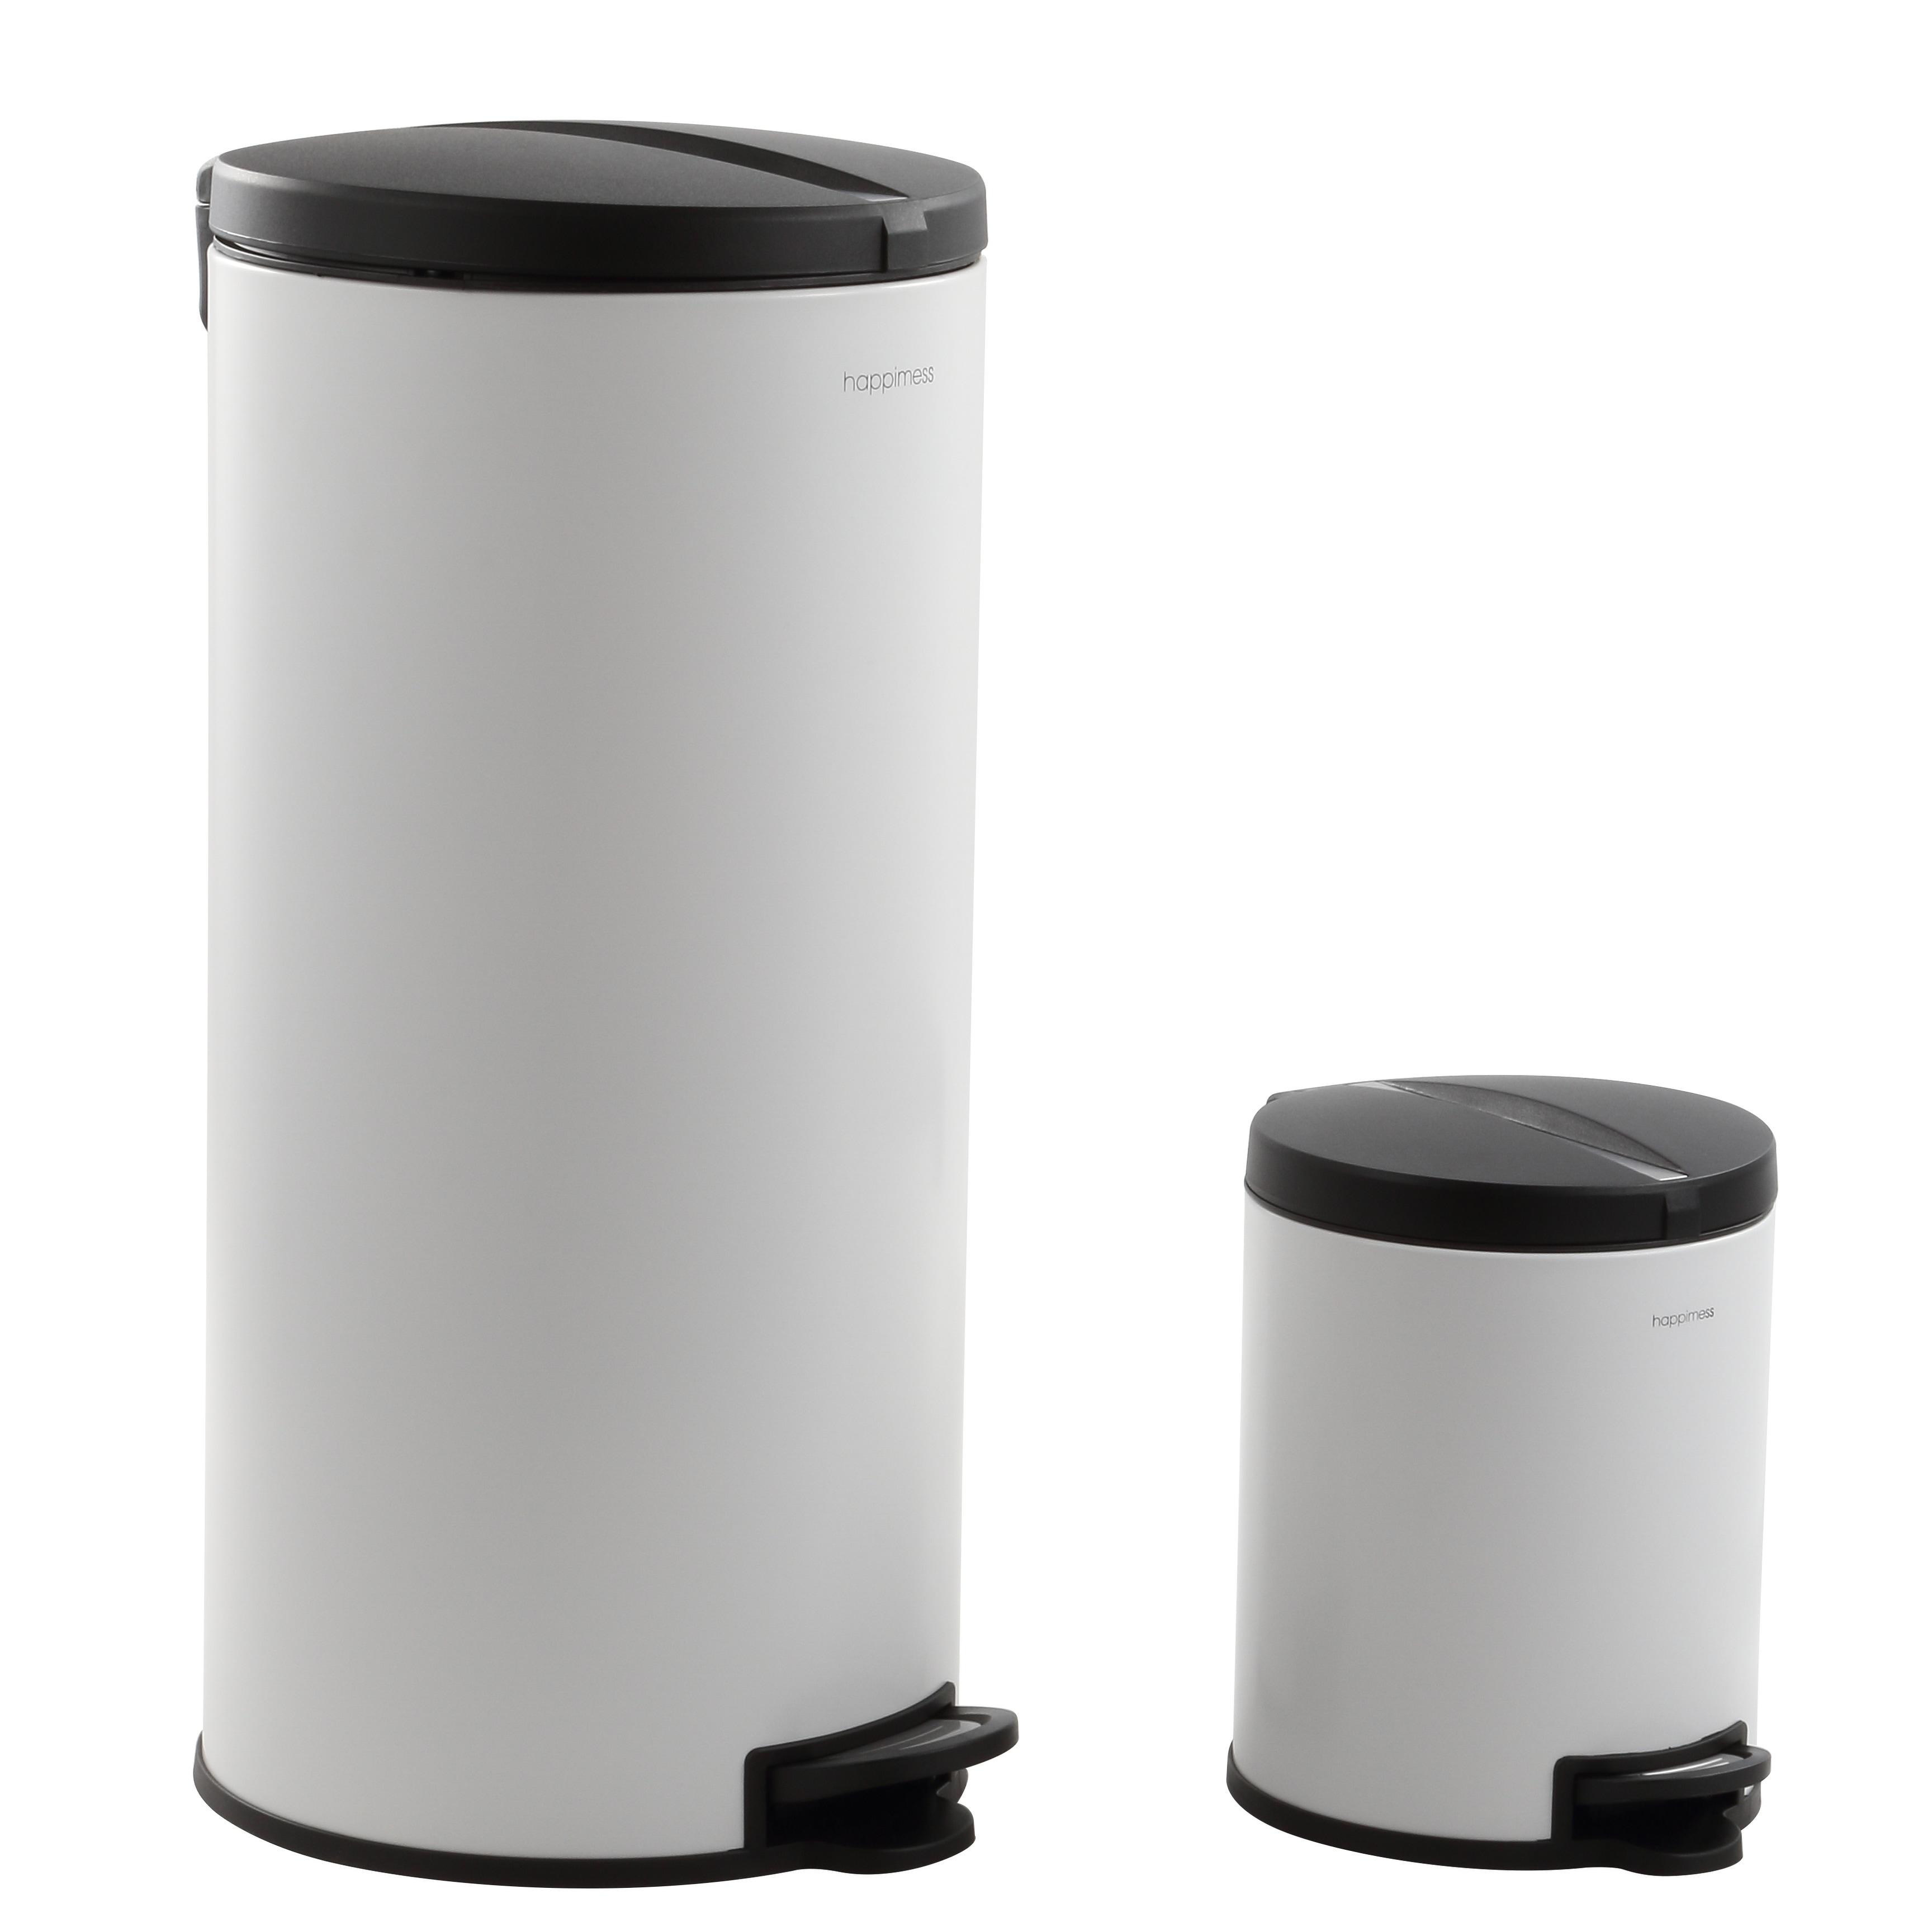 happimess Oscar Round 8-Gallon Step-Open Trash Can with FREE Mini Trash  Can, White/Black